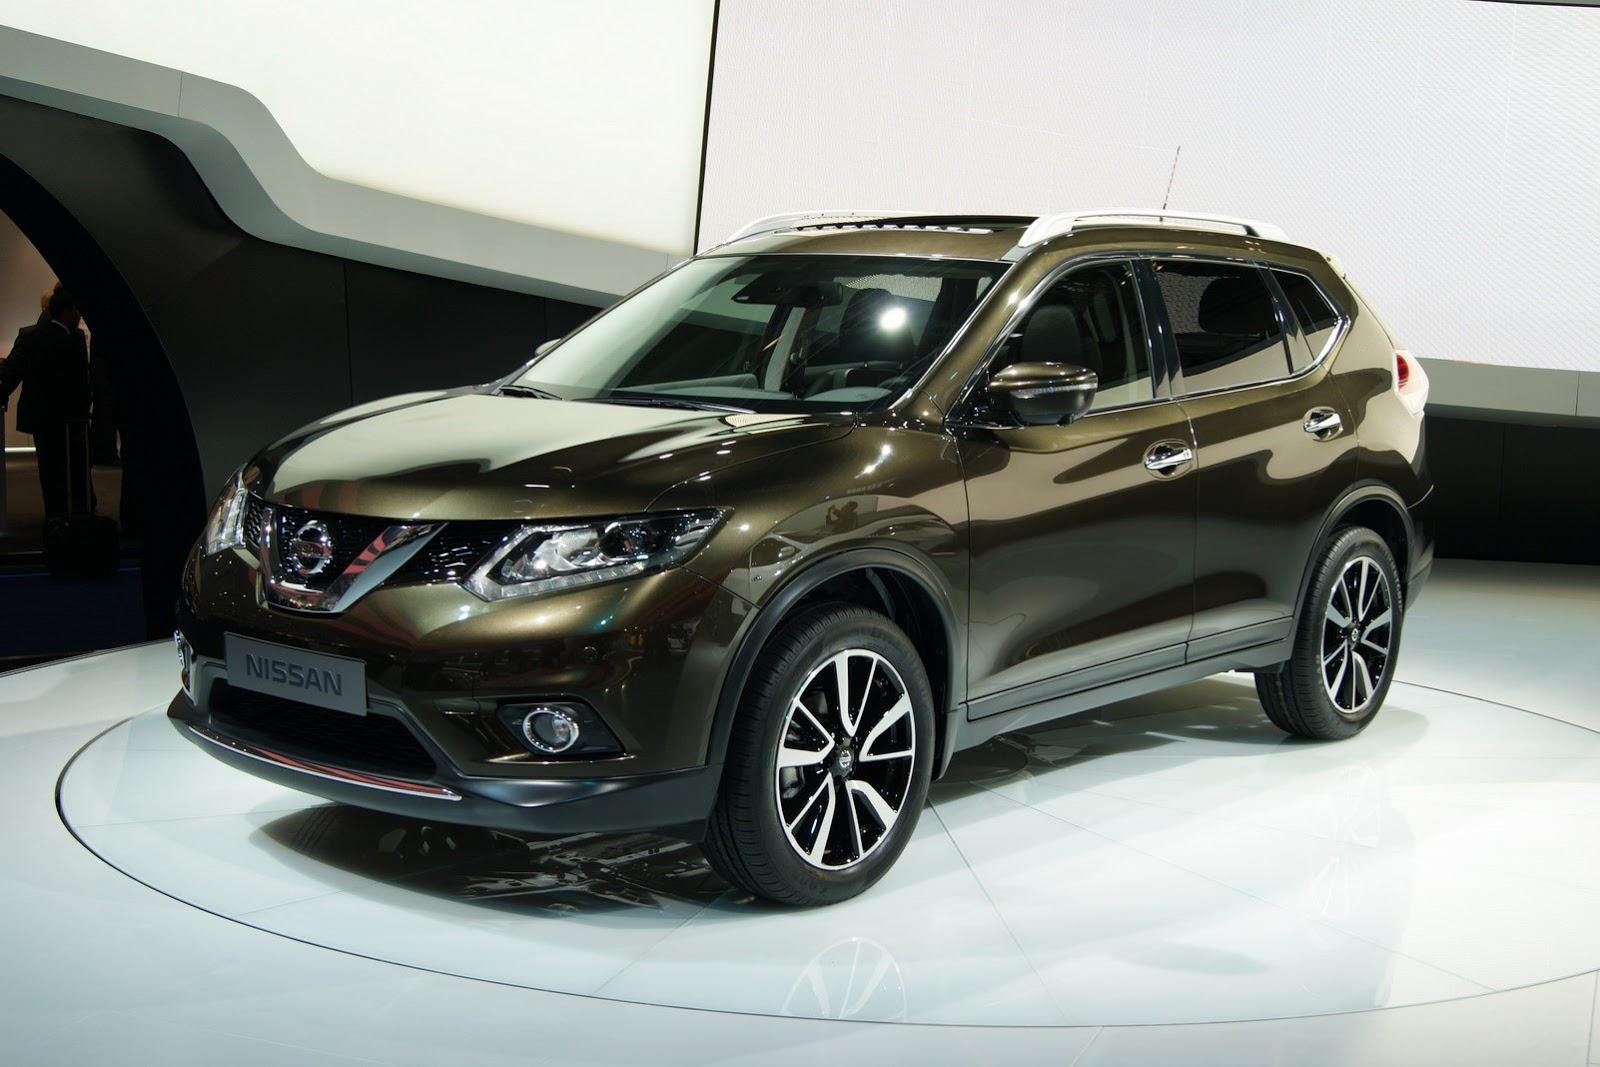 kia-avto новые автомобили и цены: